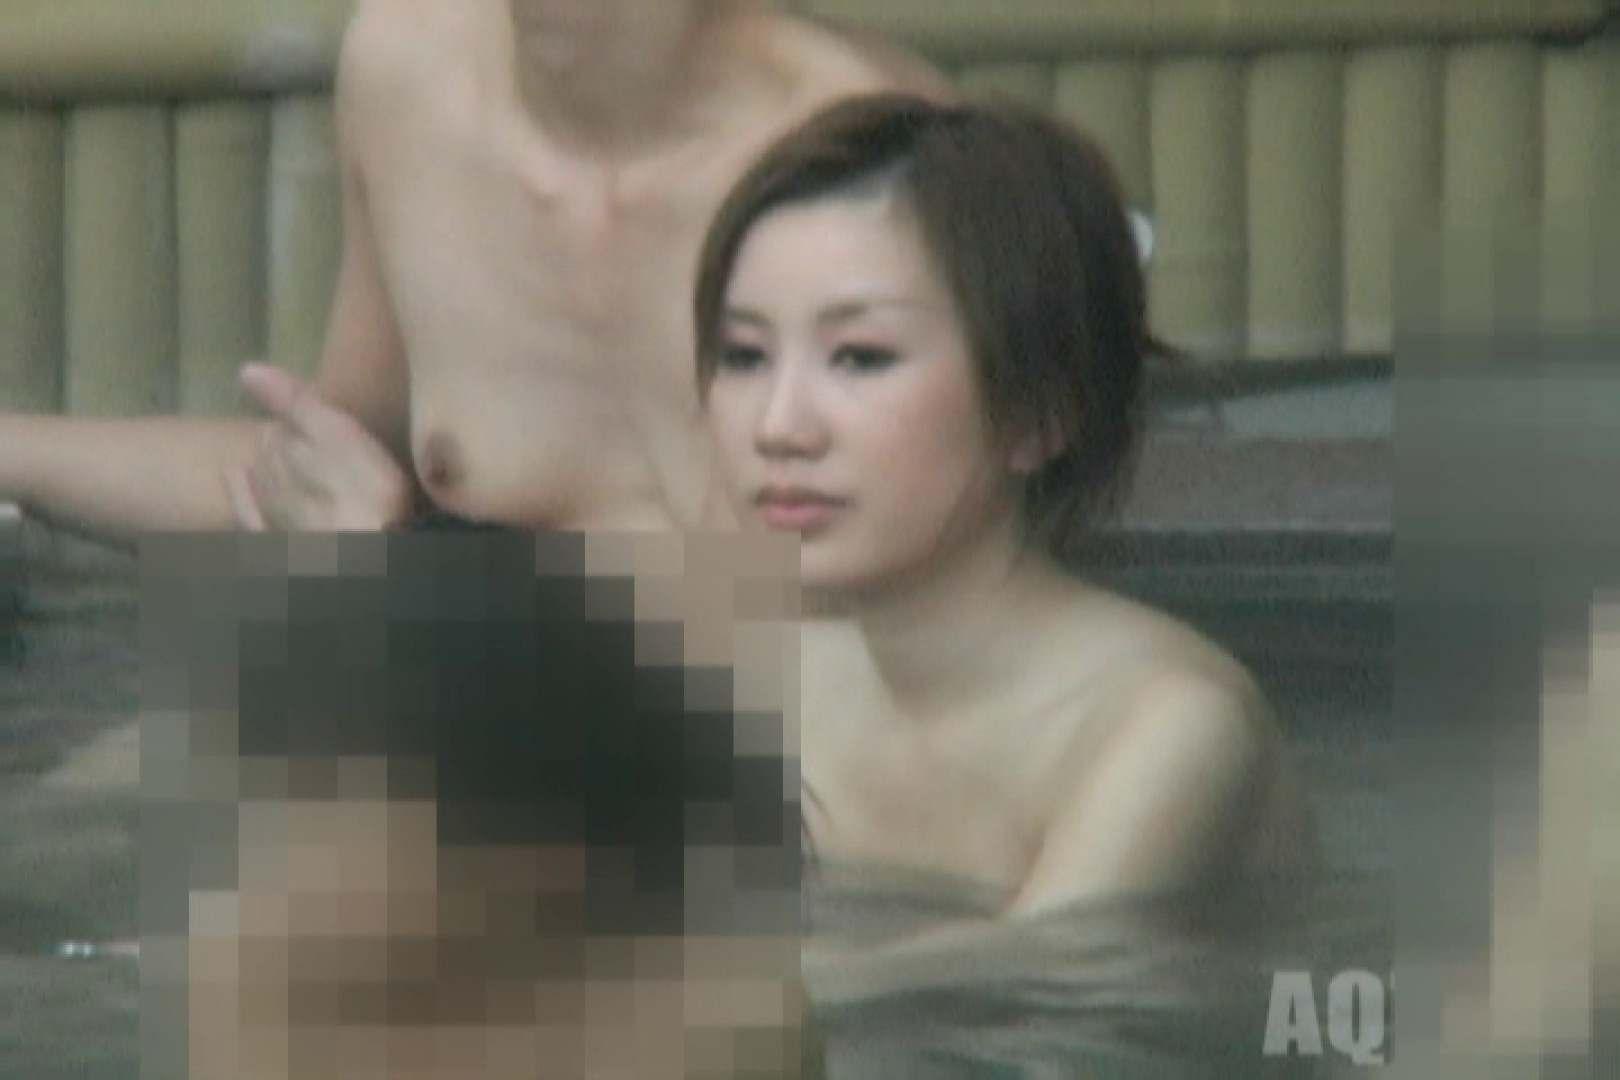 Aquaな露天風呂Vol.857 0   0  91連発 39